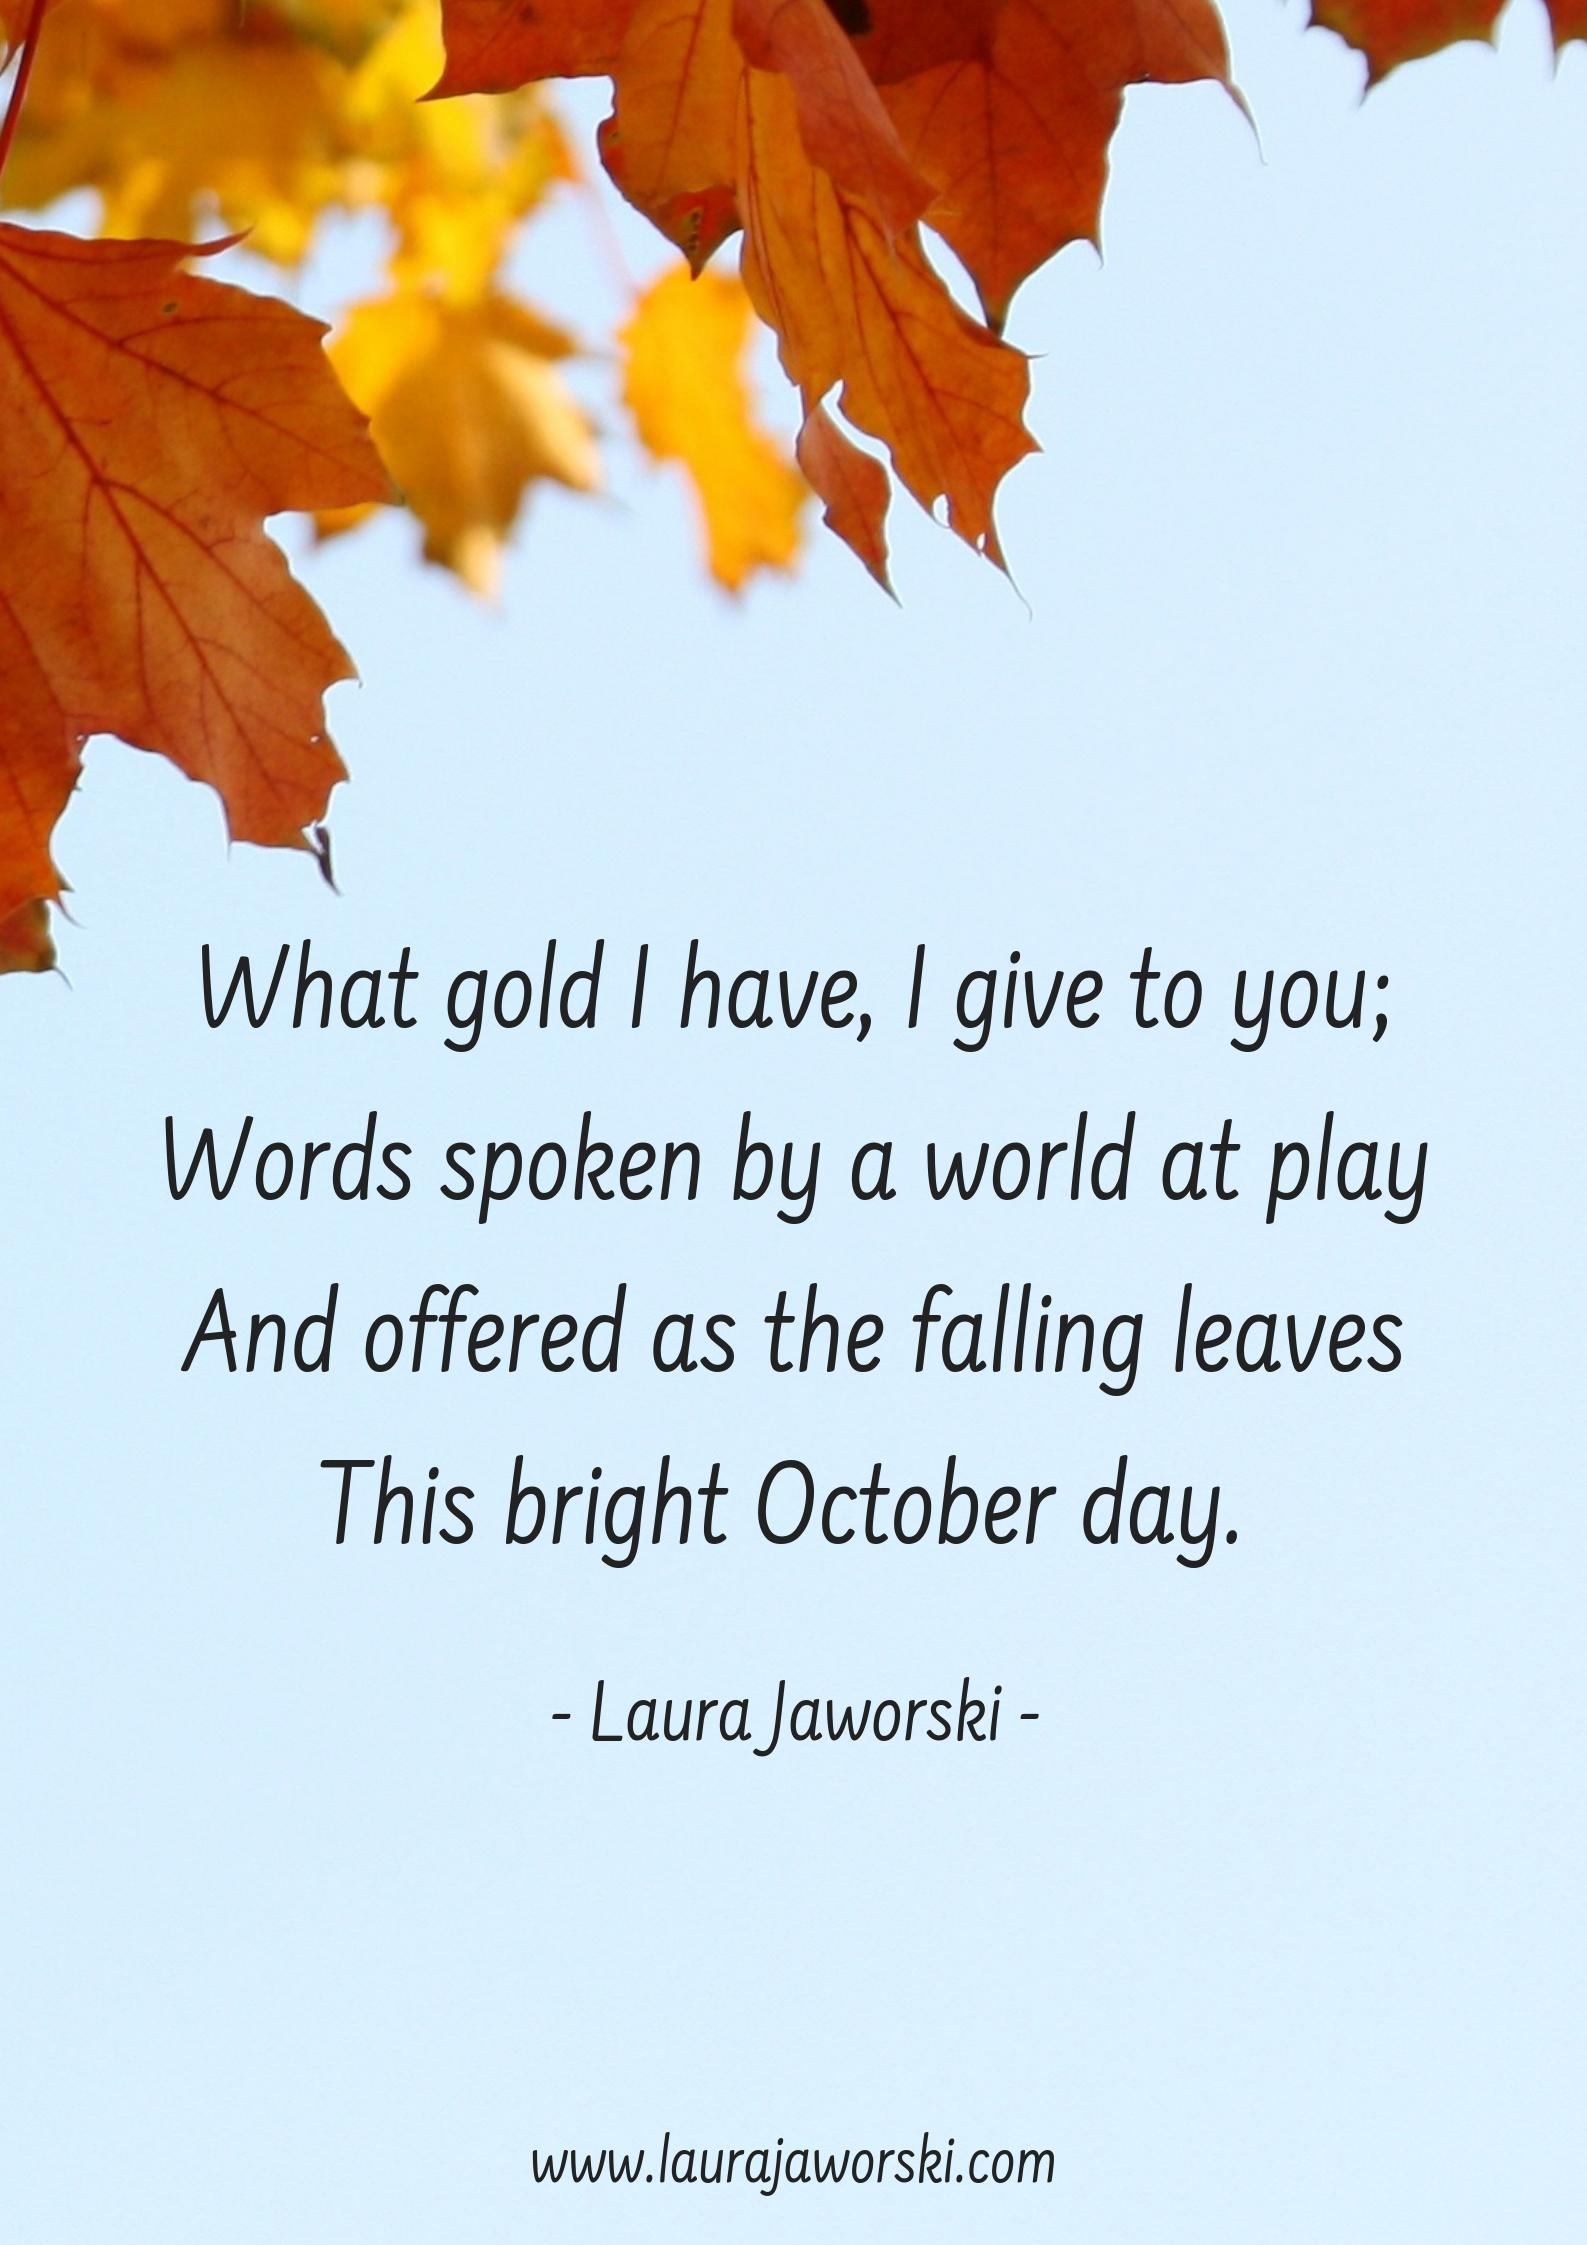 www.laurajaworski.com